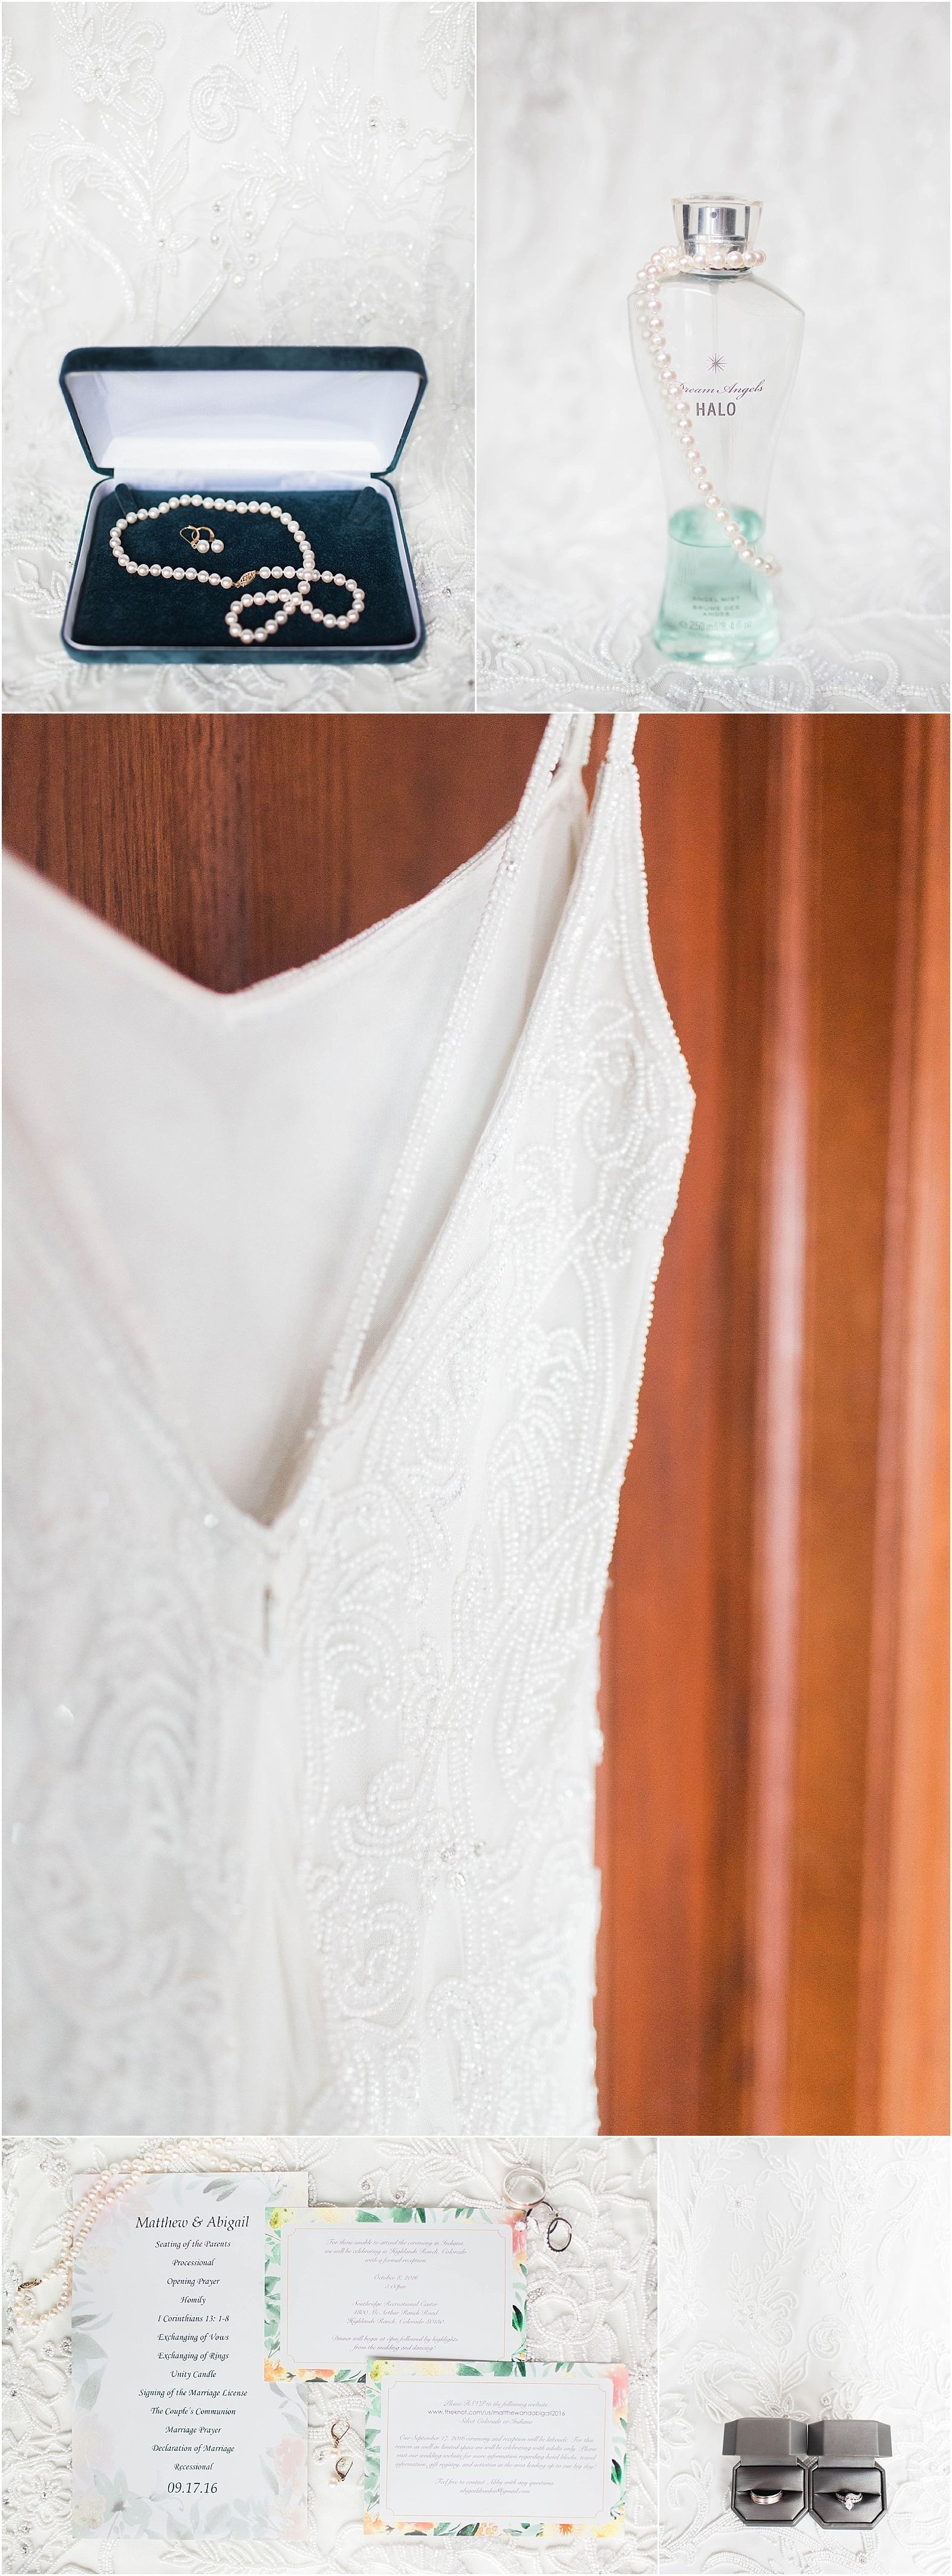 backyard wedding dresses A Beaded Wedding Dress as a staple to the natural backyard wedding Photos by Arielle